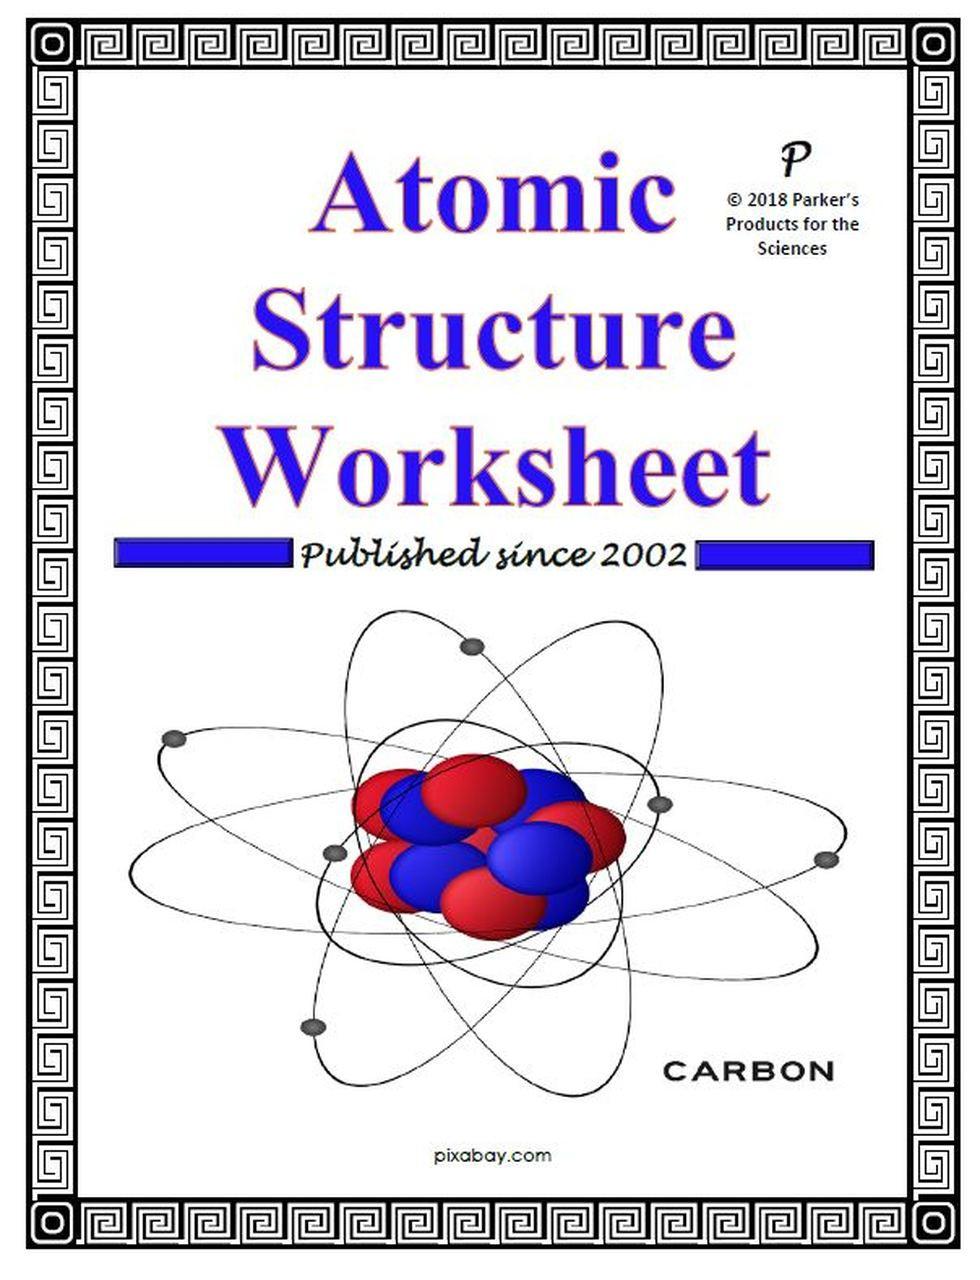 Atomic Structure Worksheet Answers Key atomic Structure Worksheet